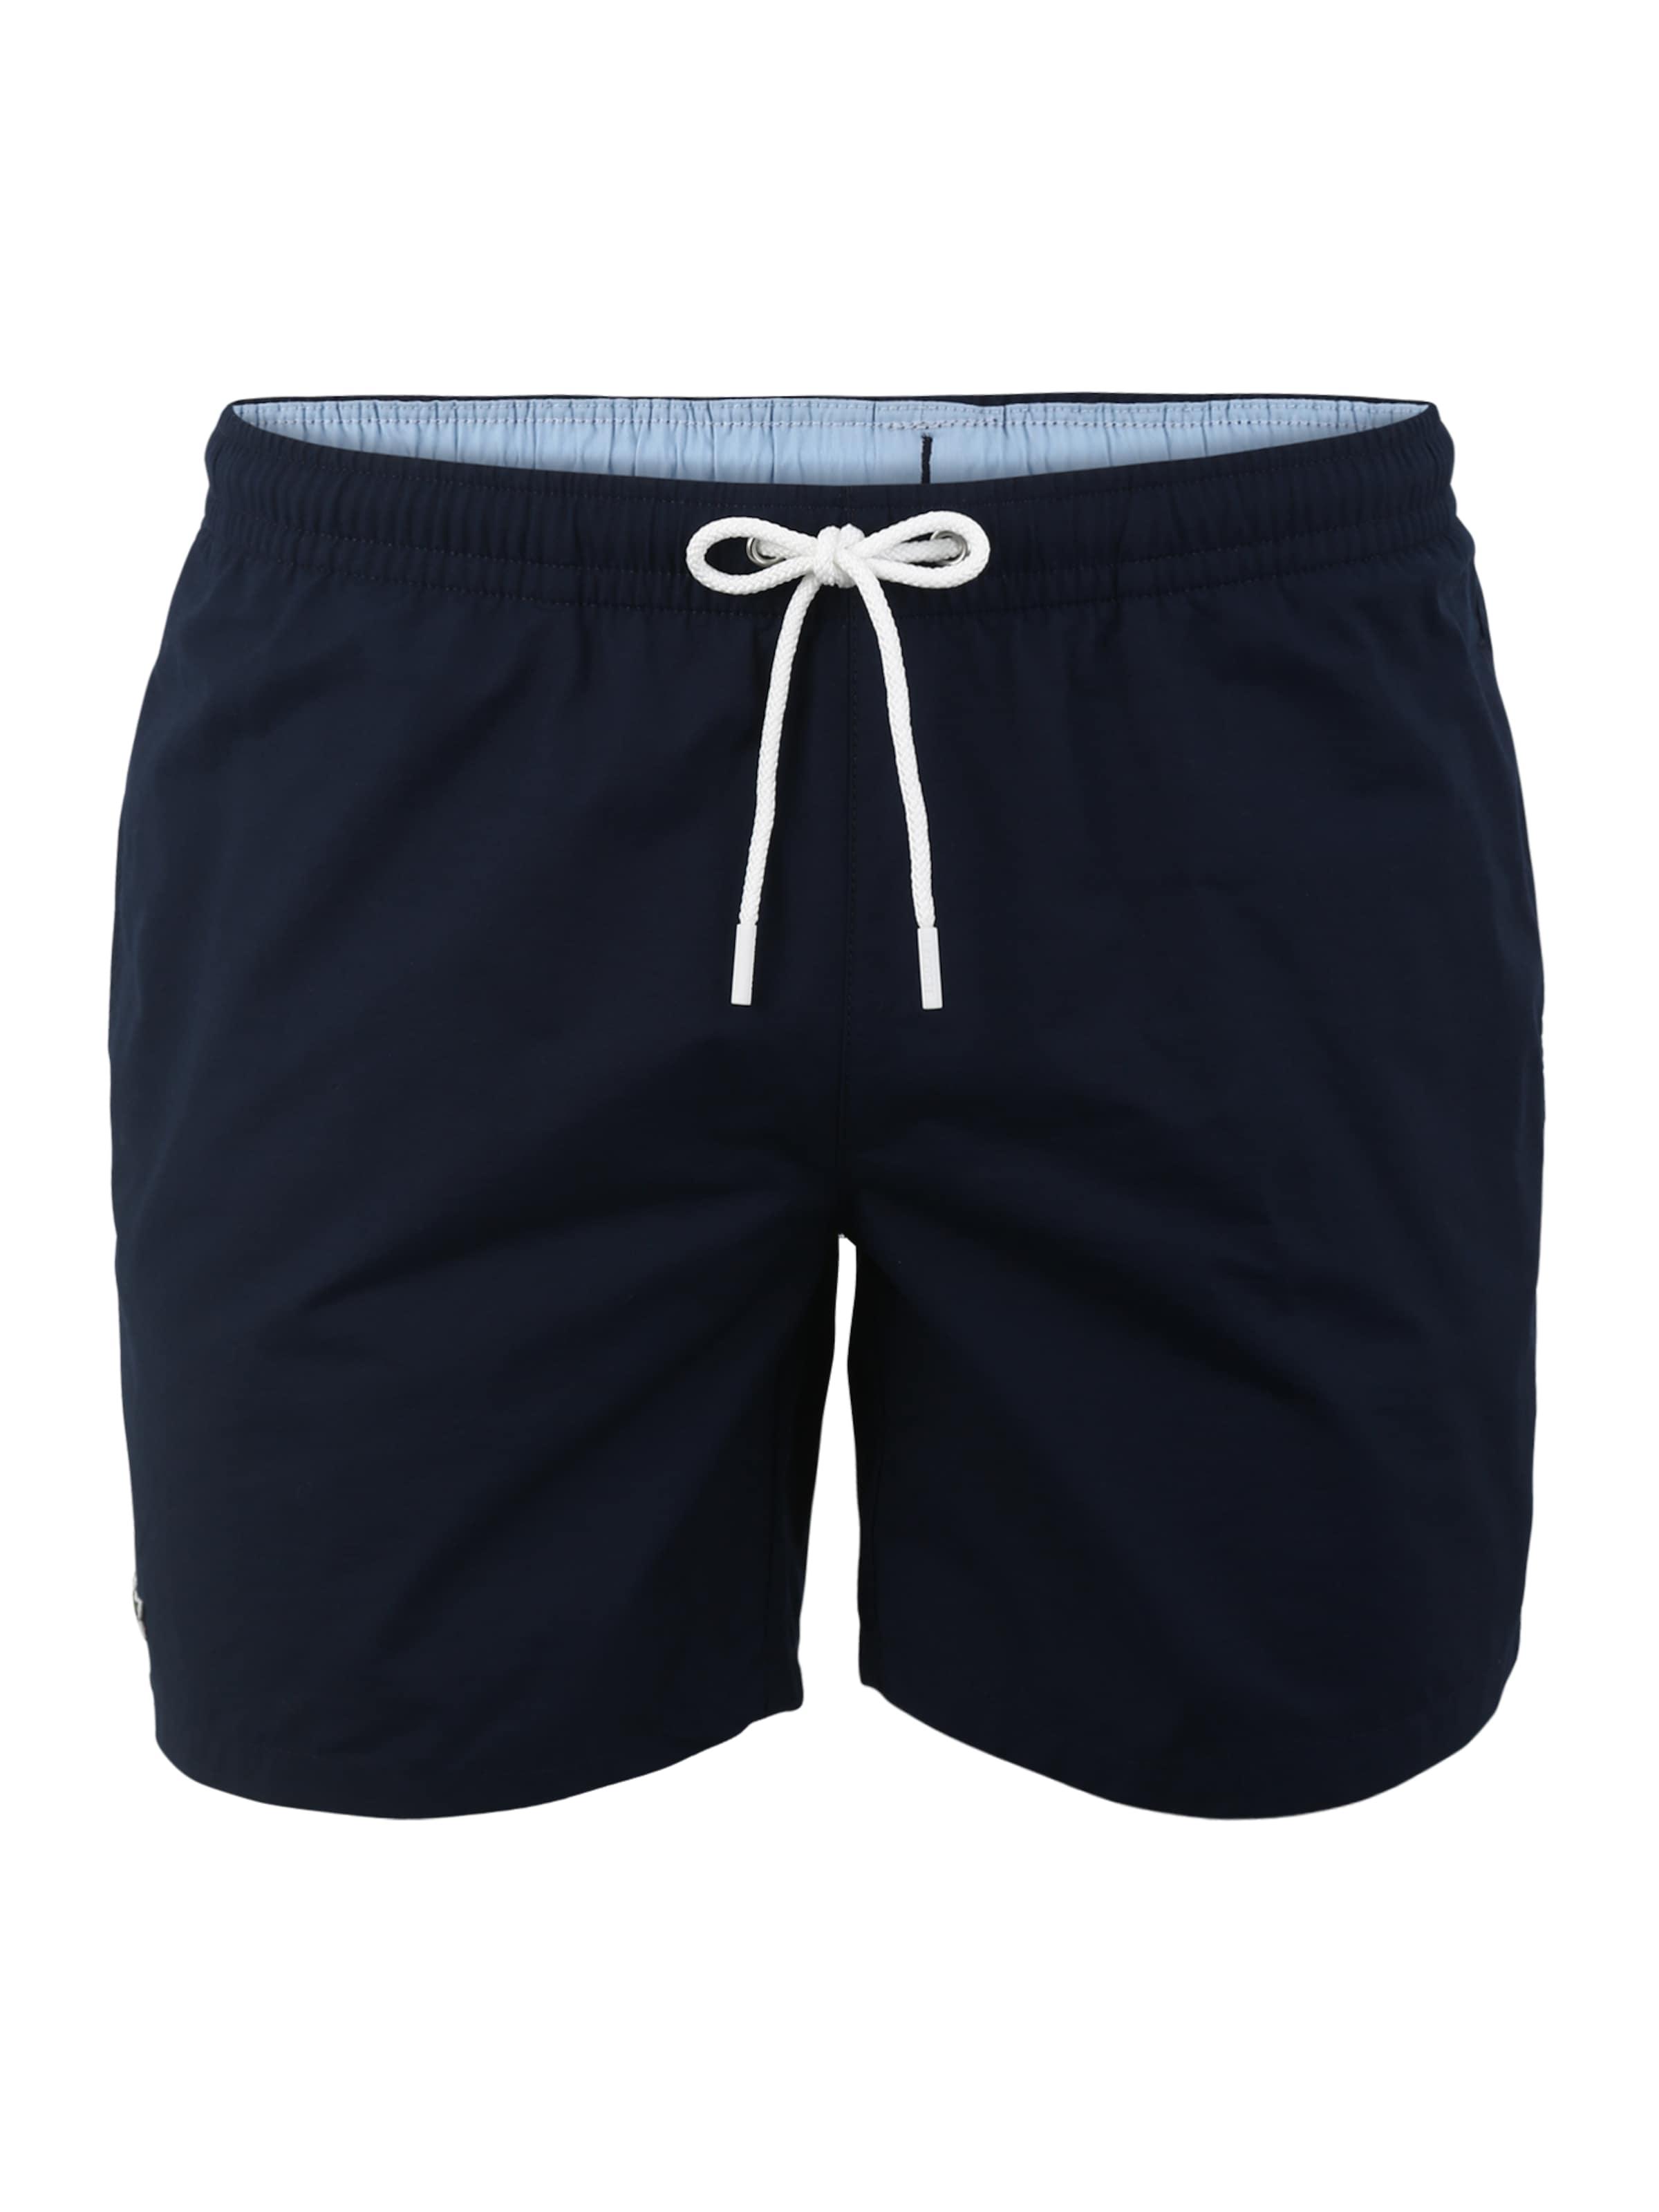 Marine En Shorts Bain Lacoste De xdBoeCr